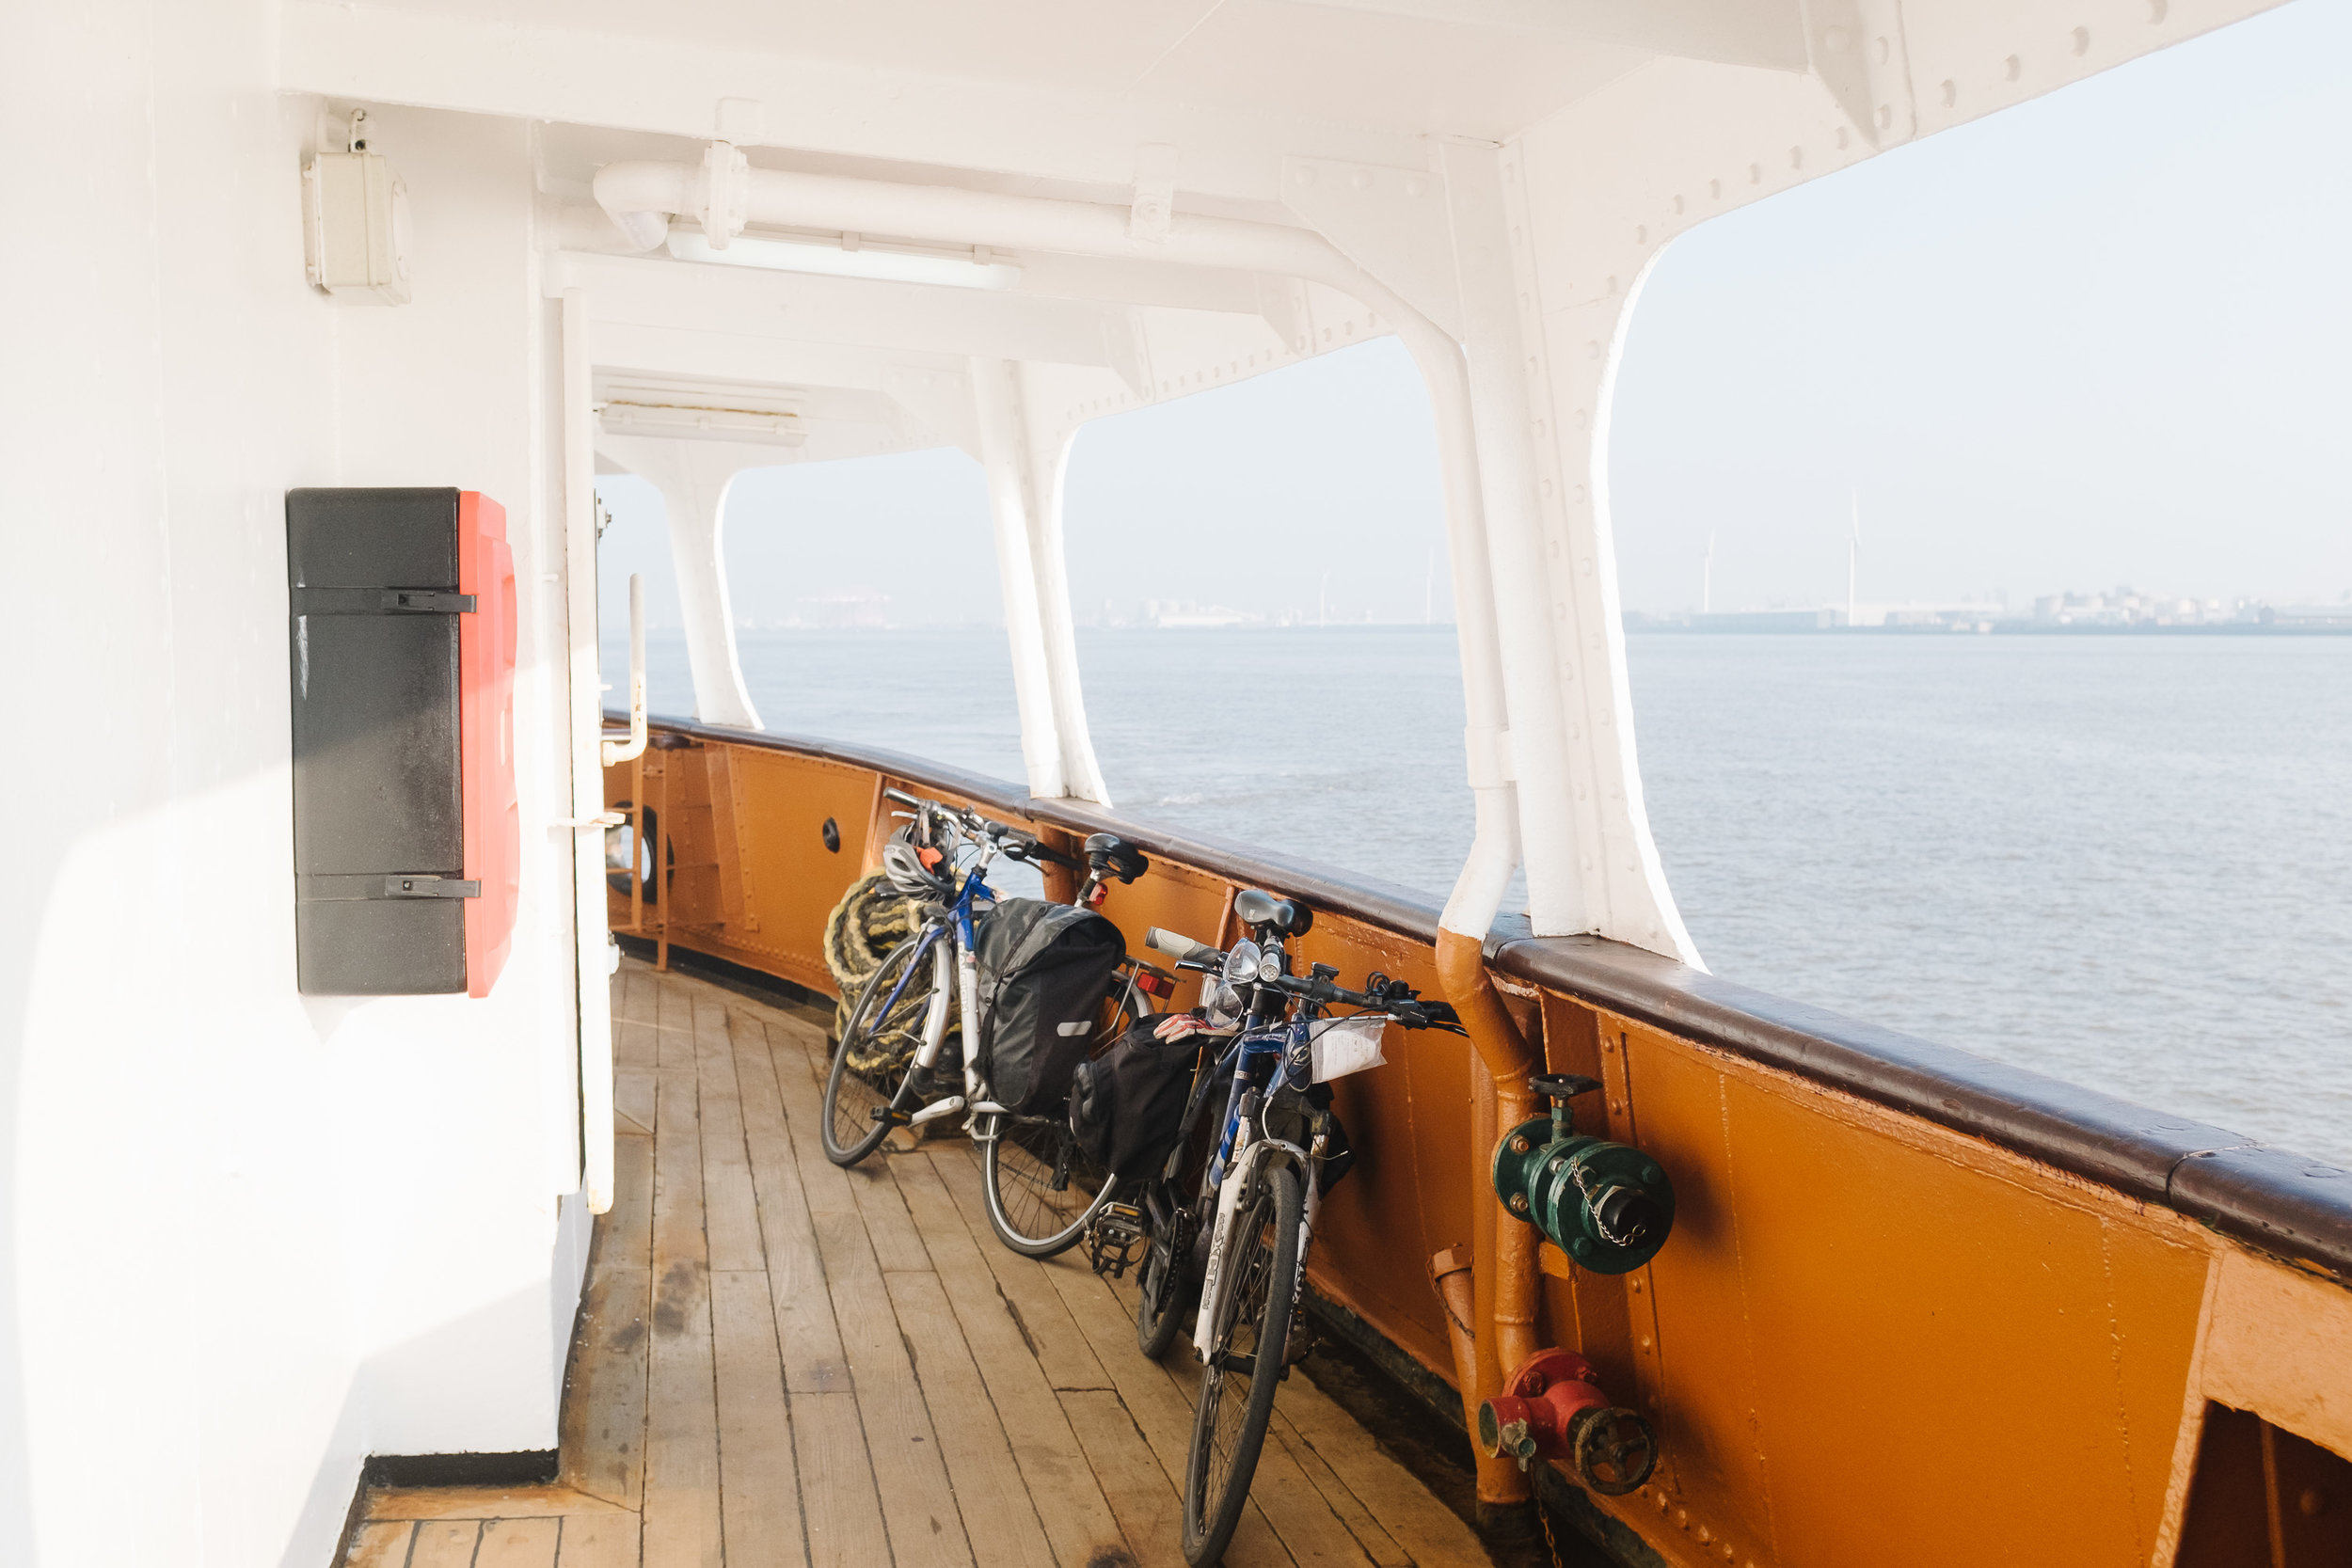 Ferry-2377-pete-carr.jpg